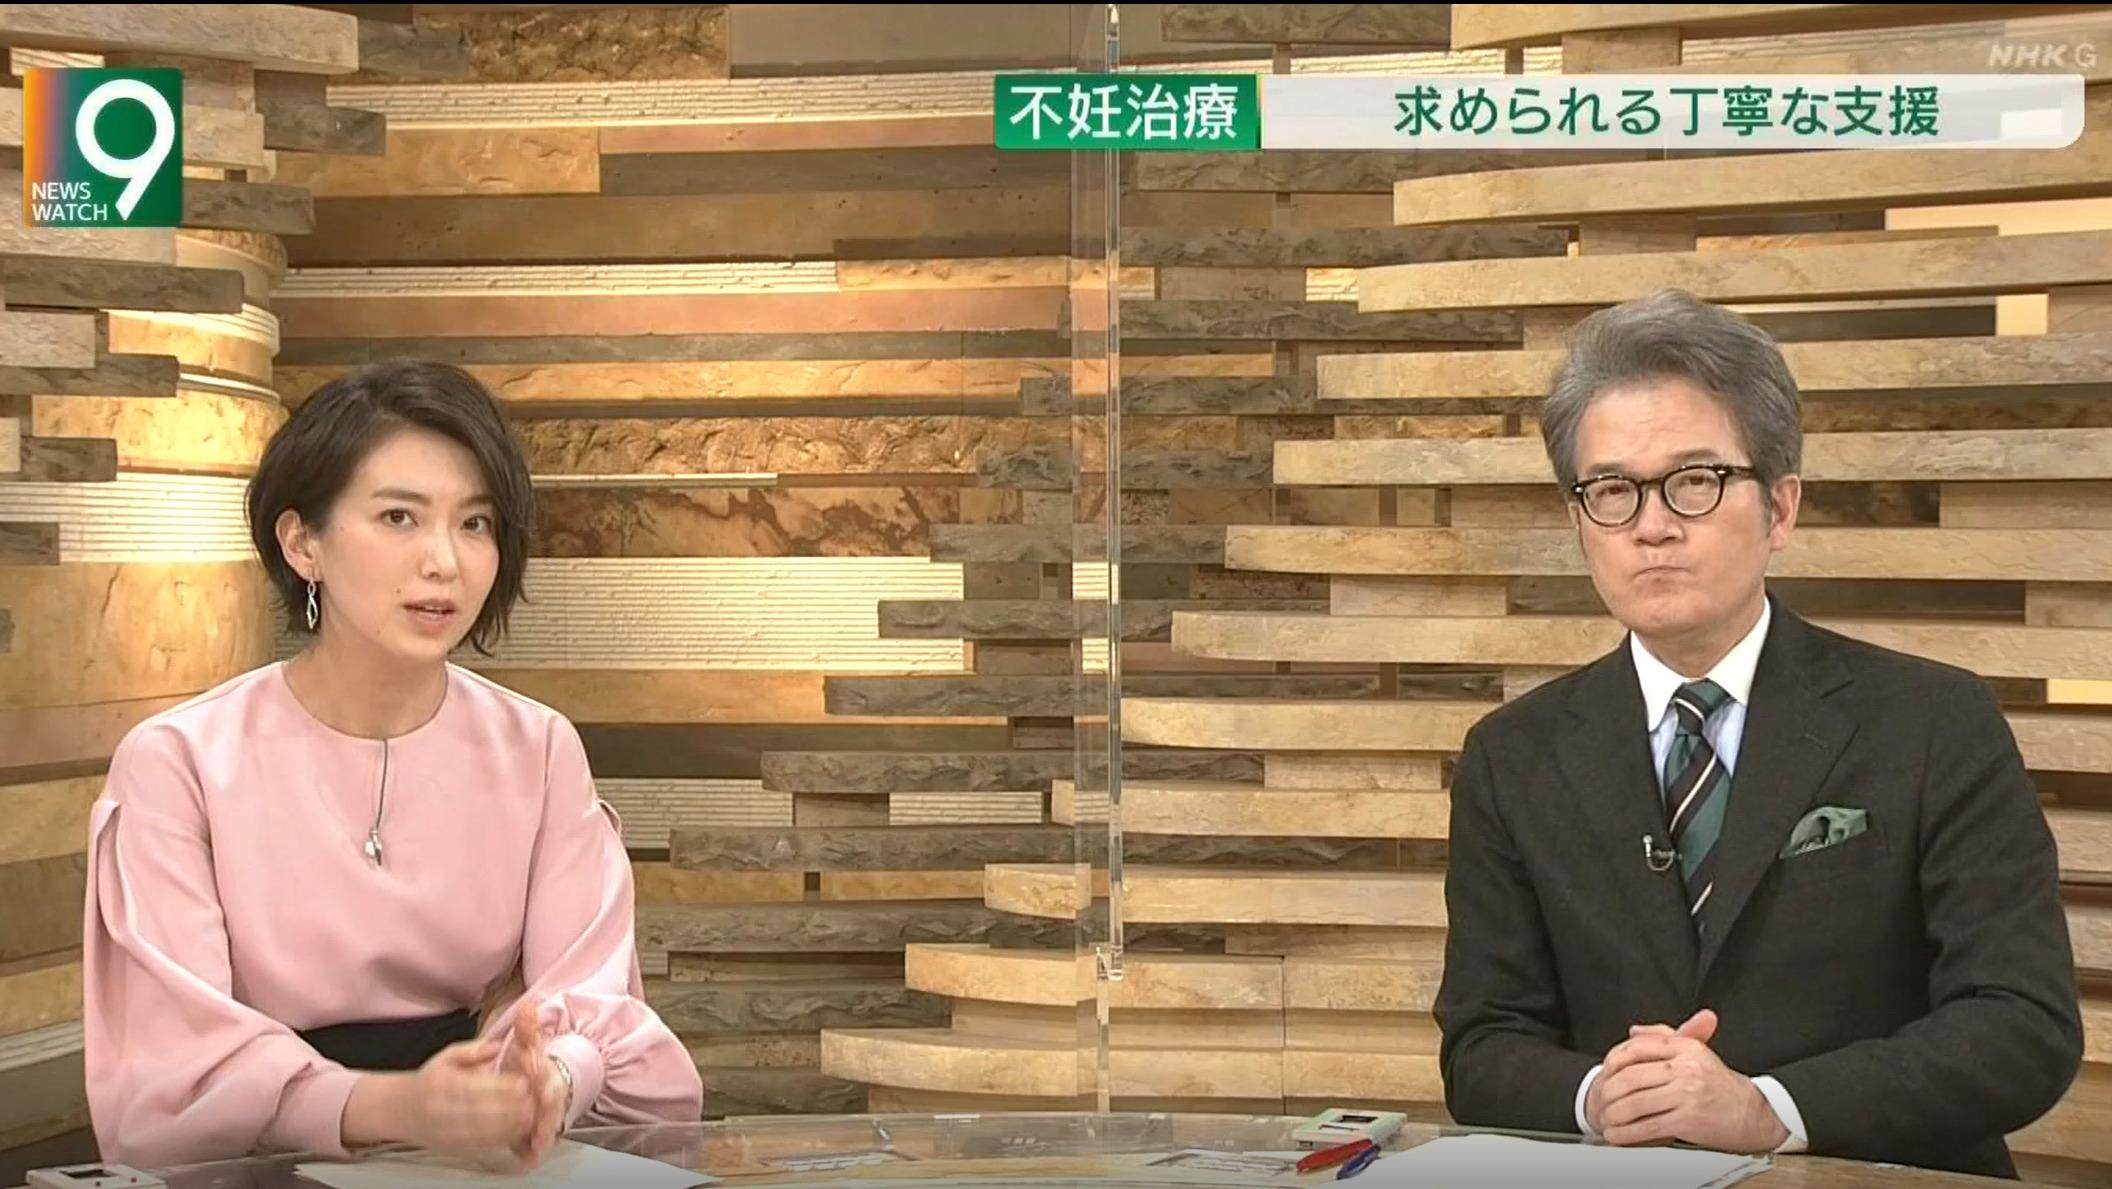 NHK全国放送「ニュースウォッチ9」にて当団体の不妊治療支援事業が紹介されました。